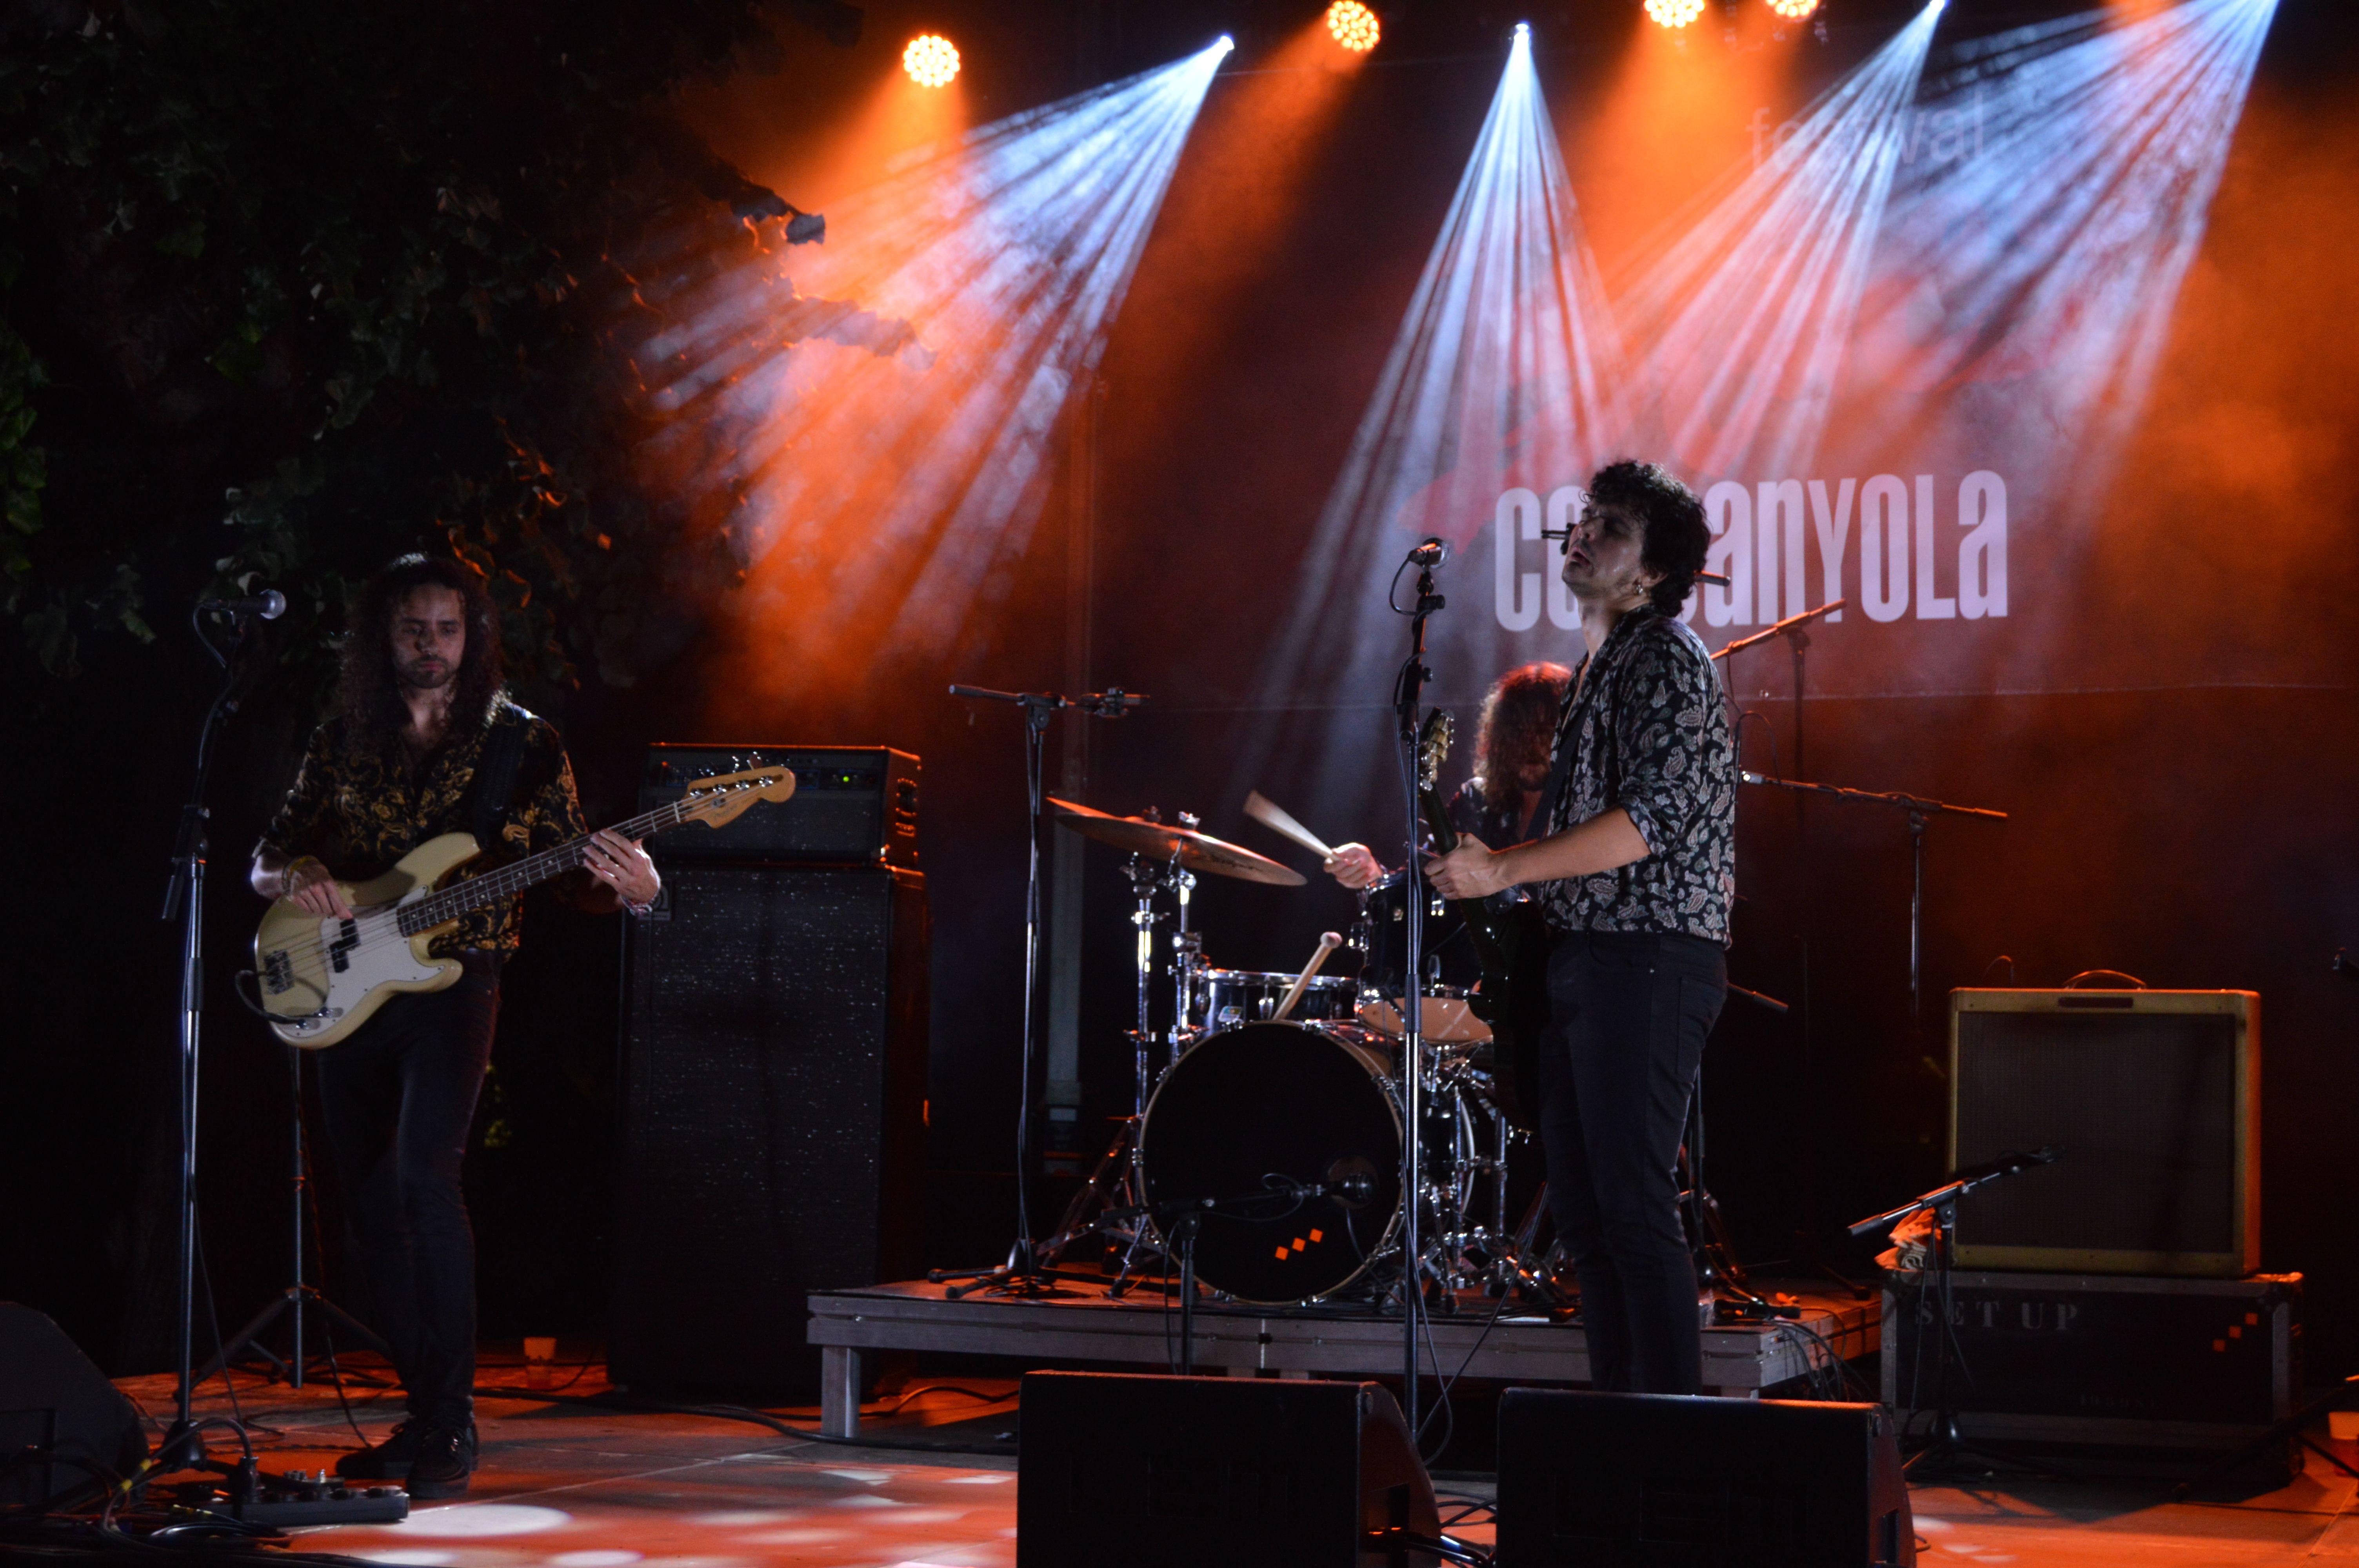 Concert de Zalomon Grass la nit de dissabte a Can Fatjó. FOTO: Nora Muñoz